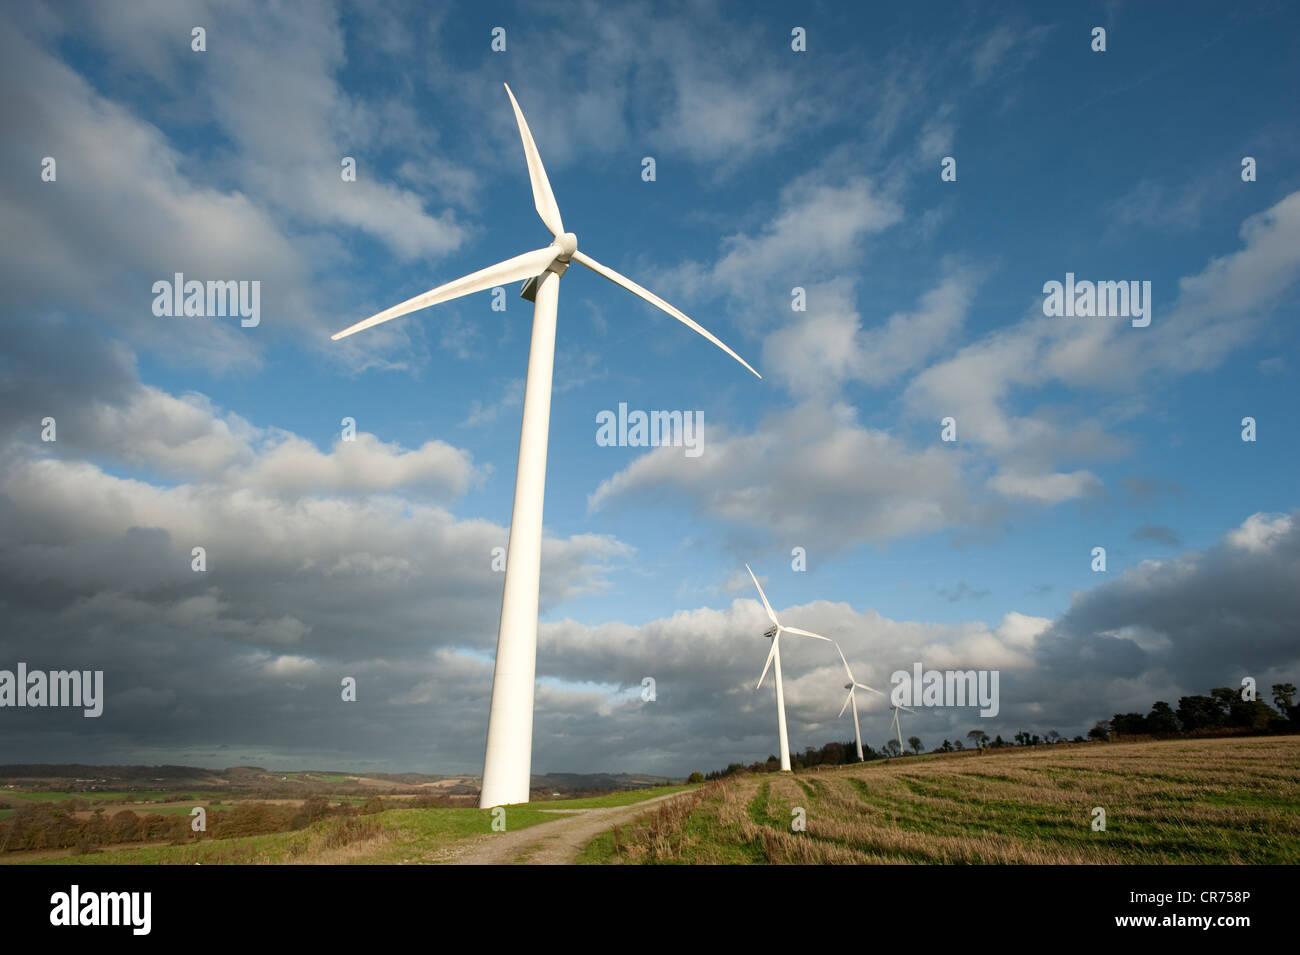 Francia, Cotes d'Armor, Caurel, parque de energía eólica Imagen De Stock